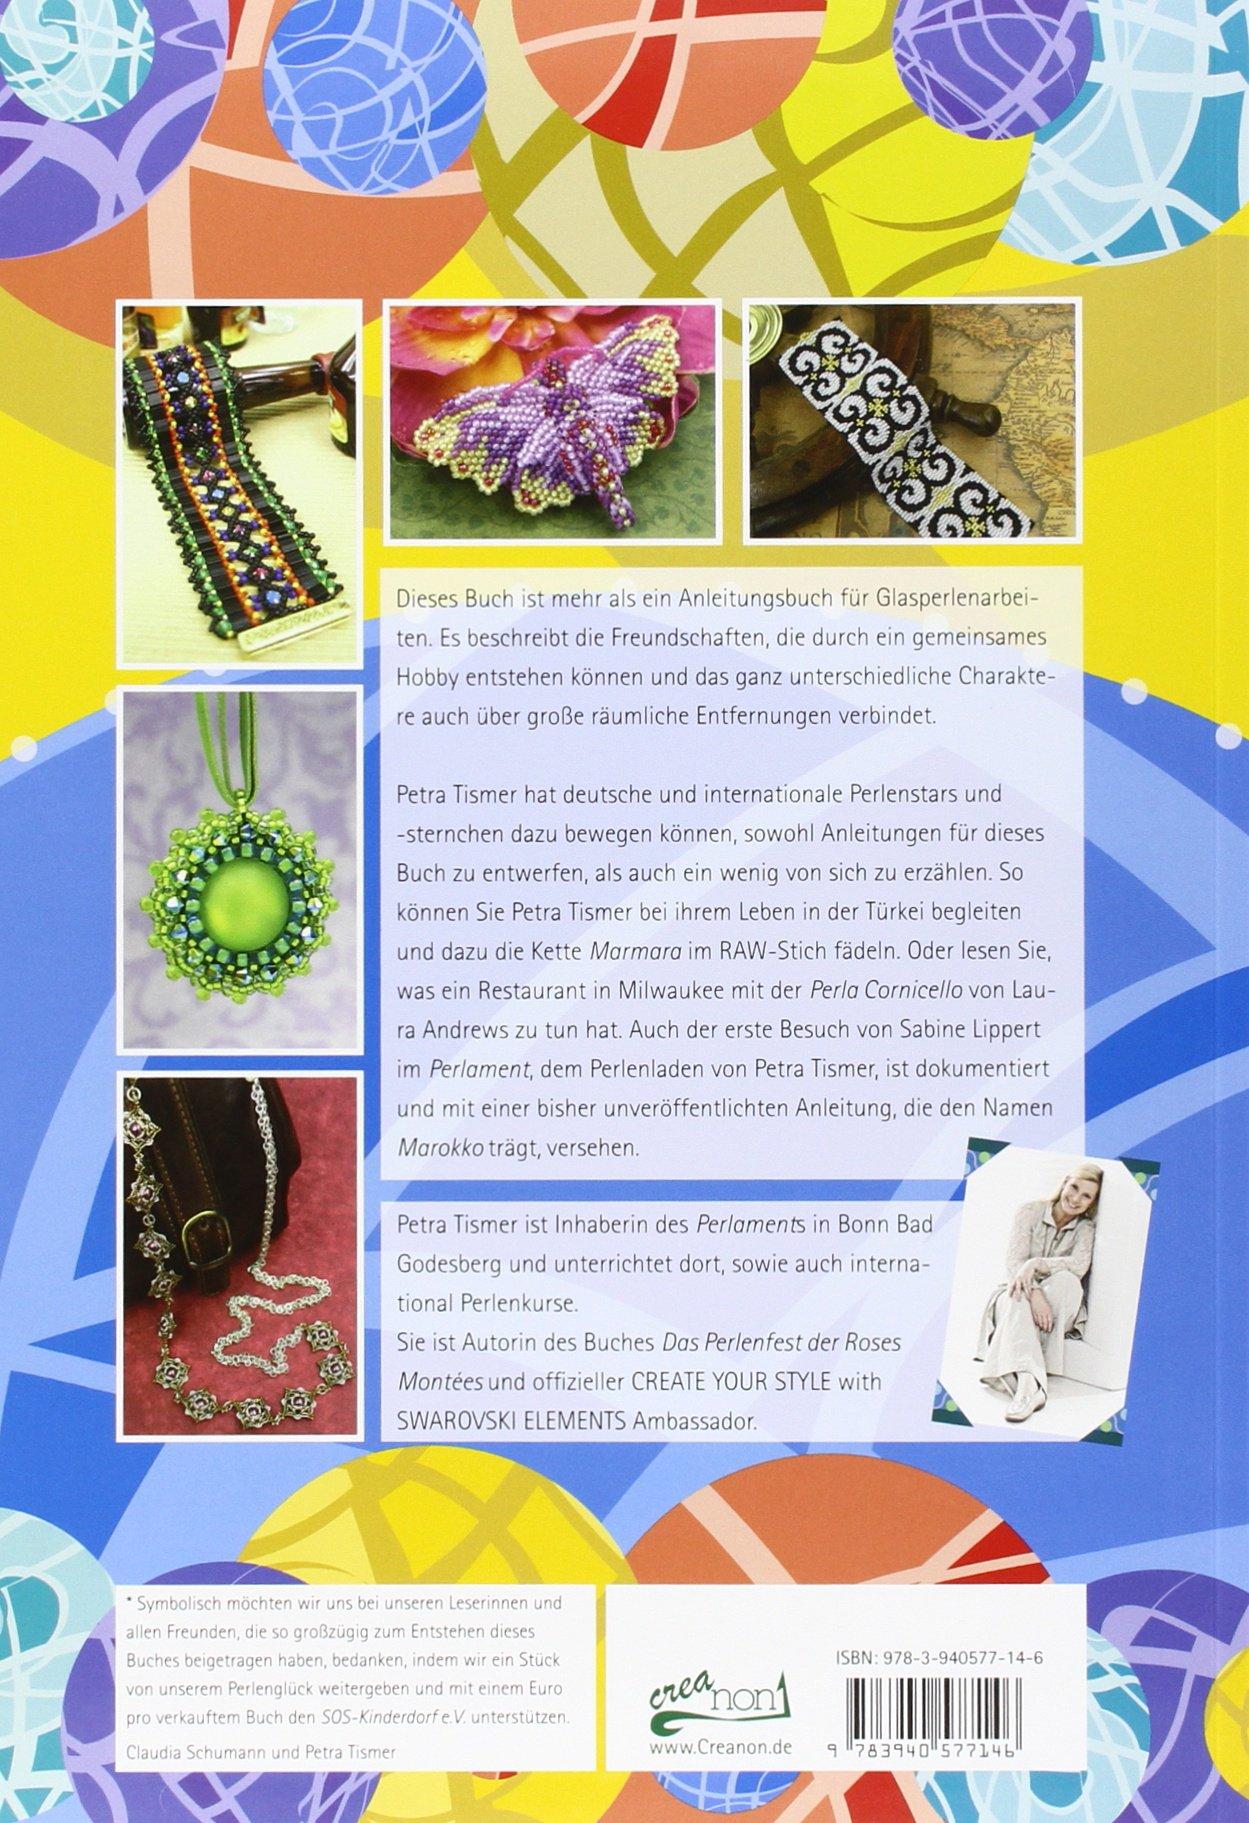 Perlen und Freundschaft: 9783940577146: Amazon.com: Books